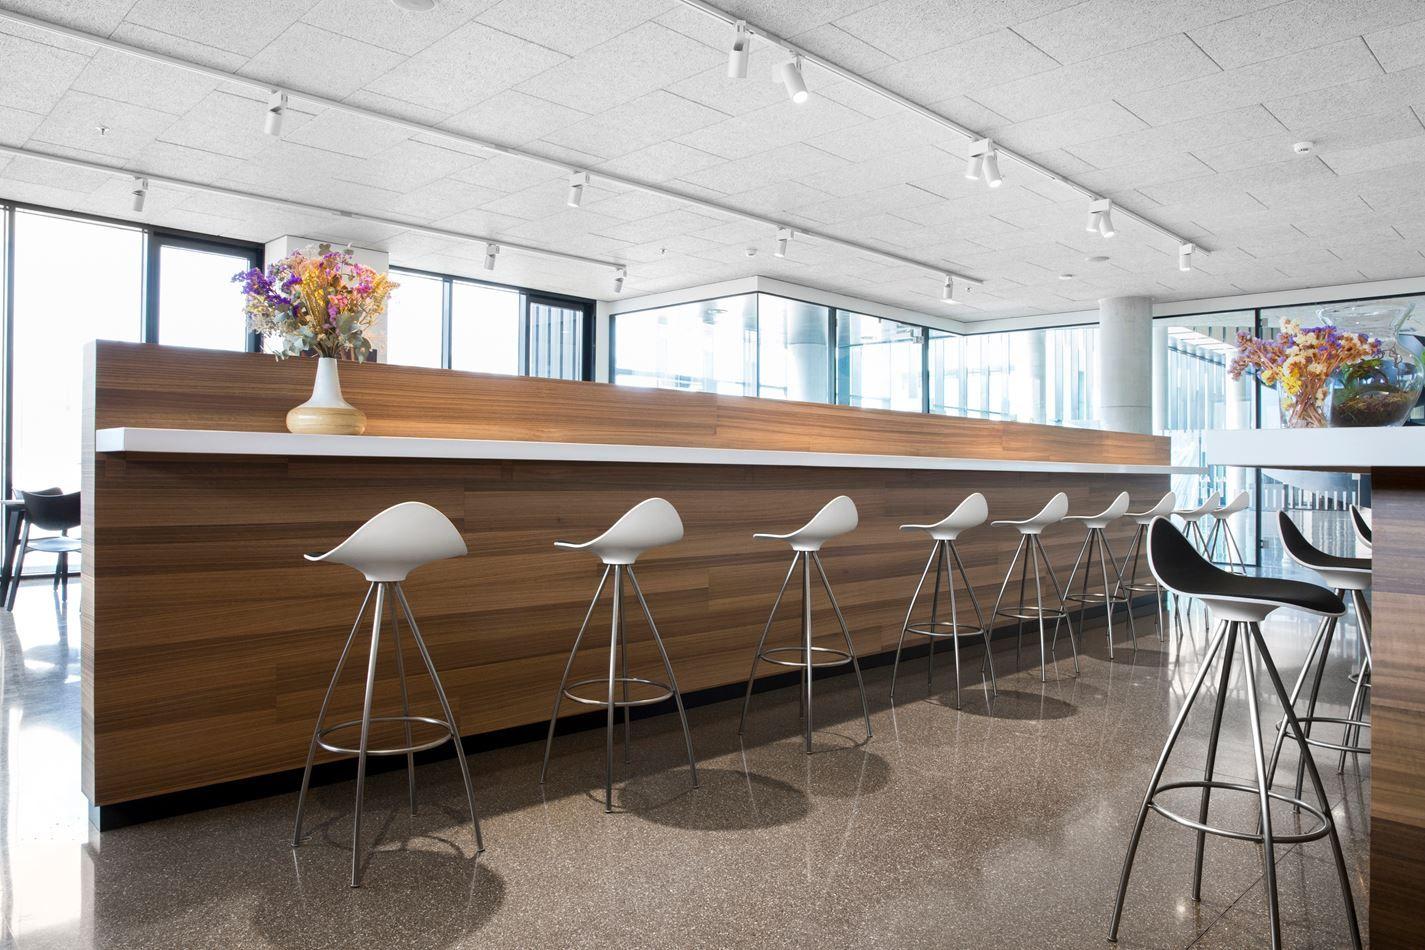 Orona Ideo Headquarters Picture gallery Ideo, Design